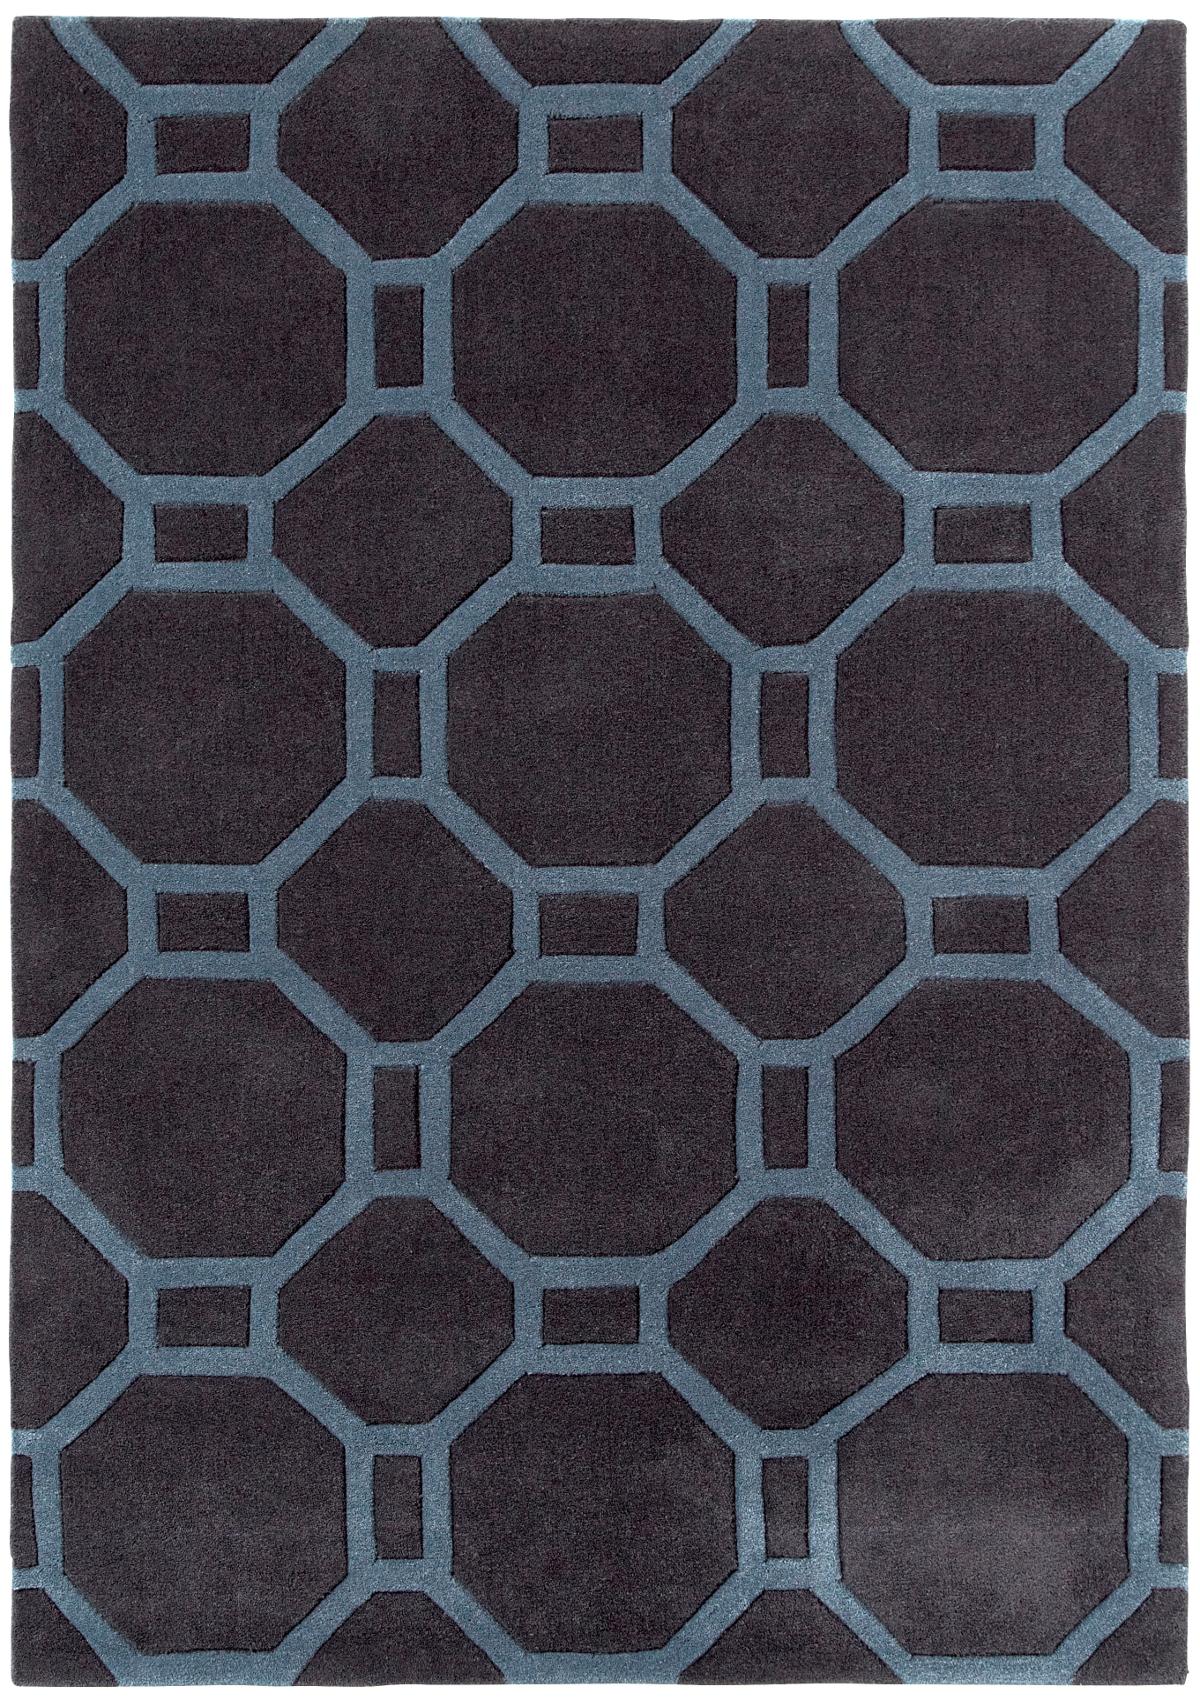 Modern Geometric Design Rug Octagon Amp Rectangle 100